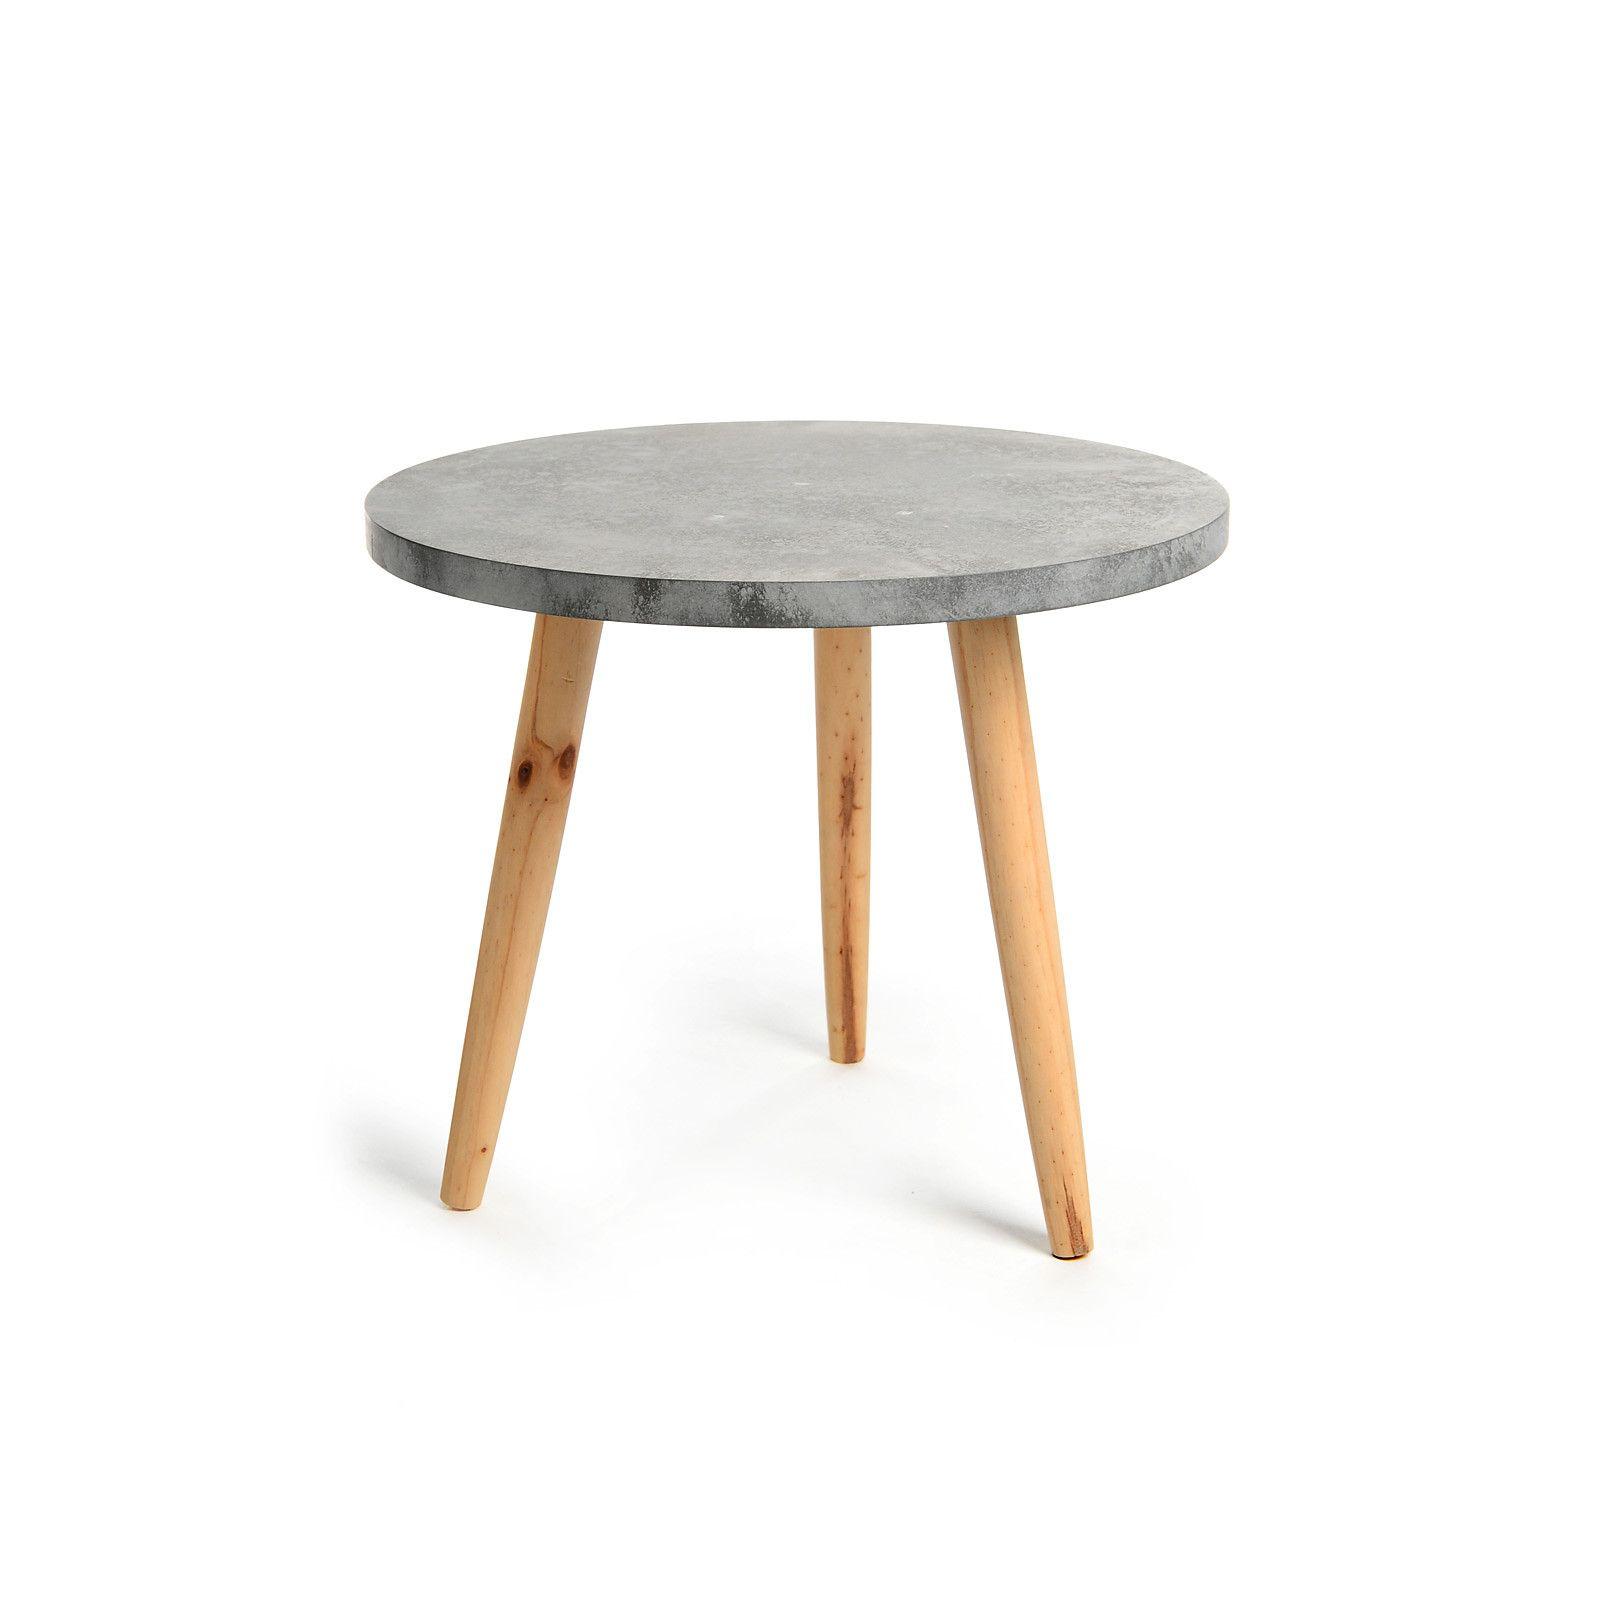 beistelltisch betonoptik kiefernholz grau ca d:50 x h:42 cm, Moderne